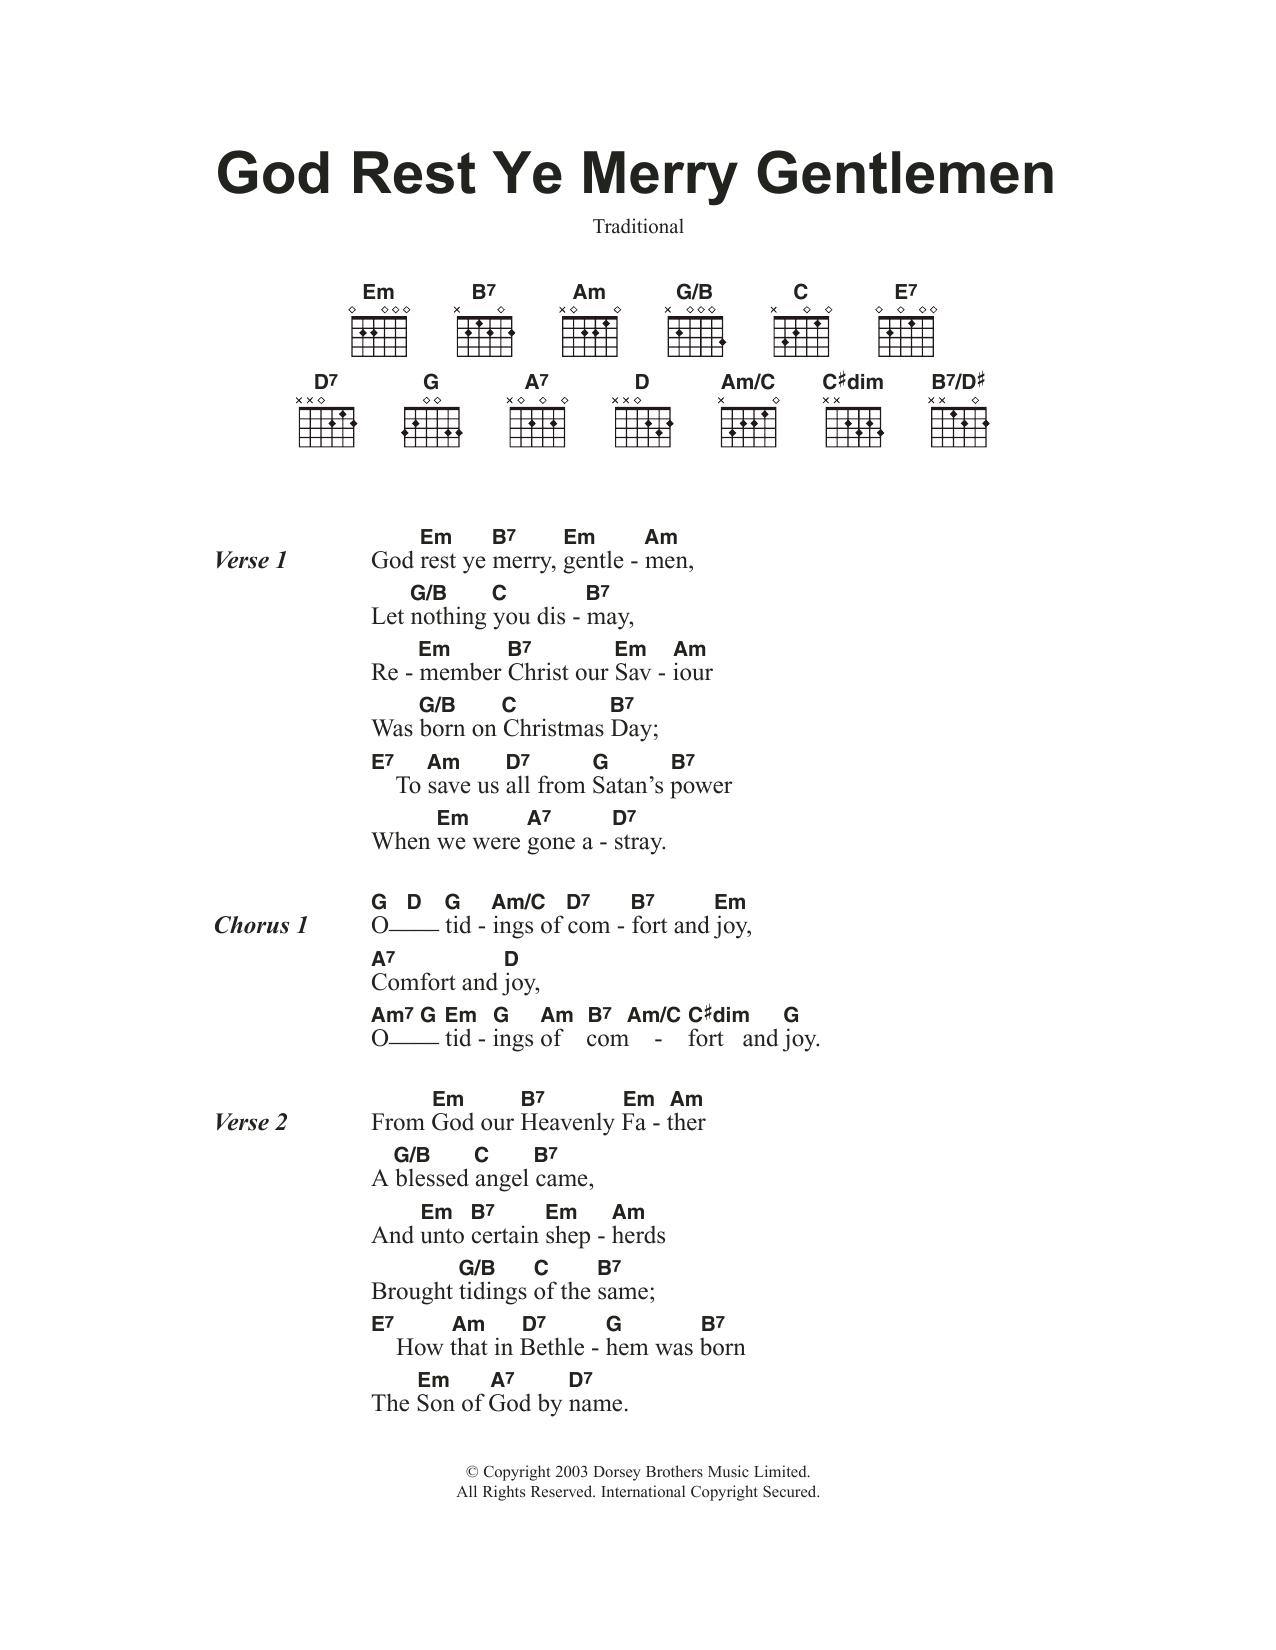 God Rest Ye Merry, Gentlemen Sheet Music | Christmas Carol | Guitar Chords/Lyrics